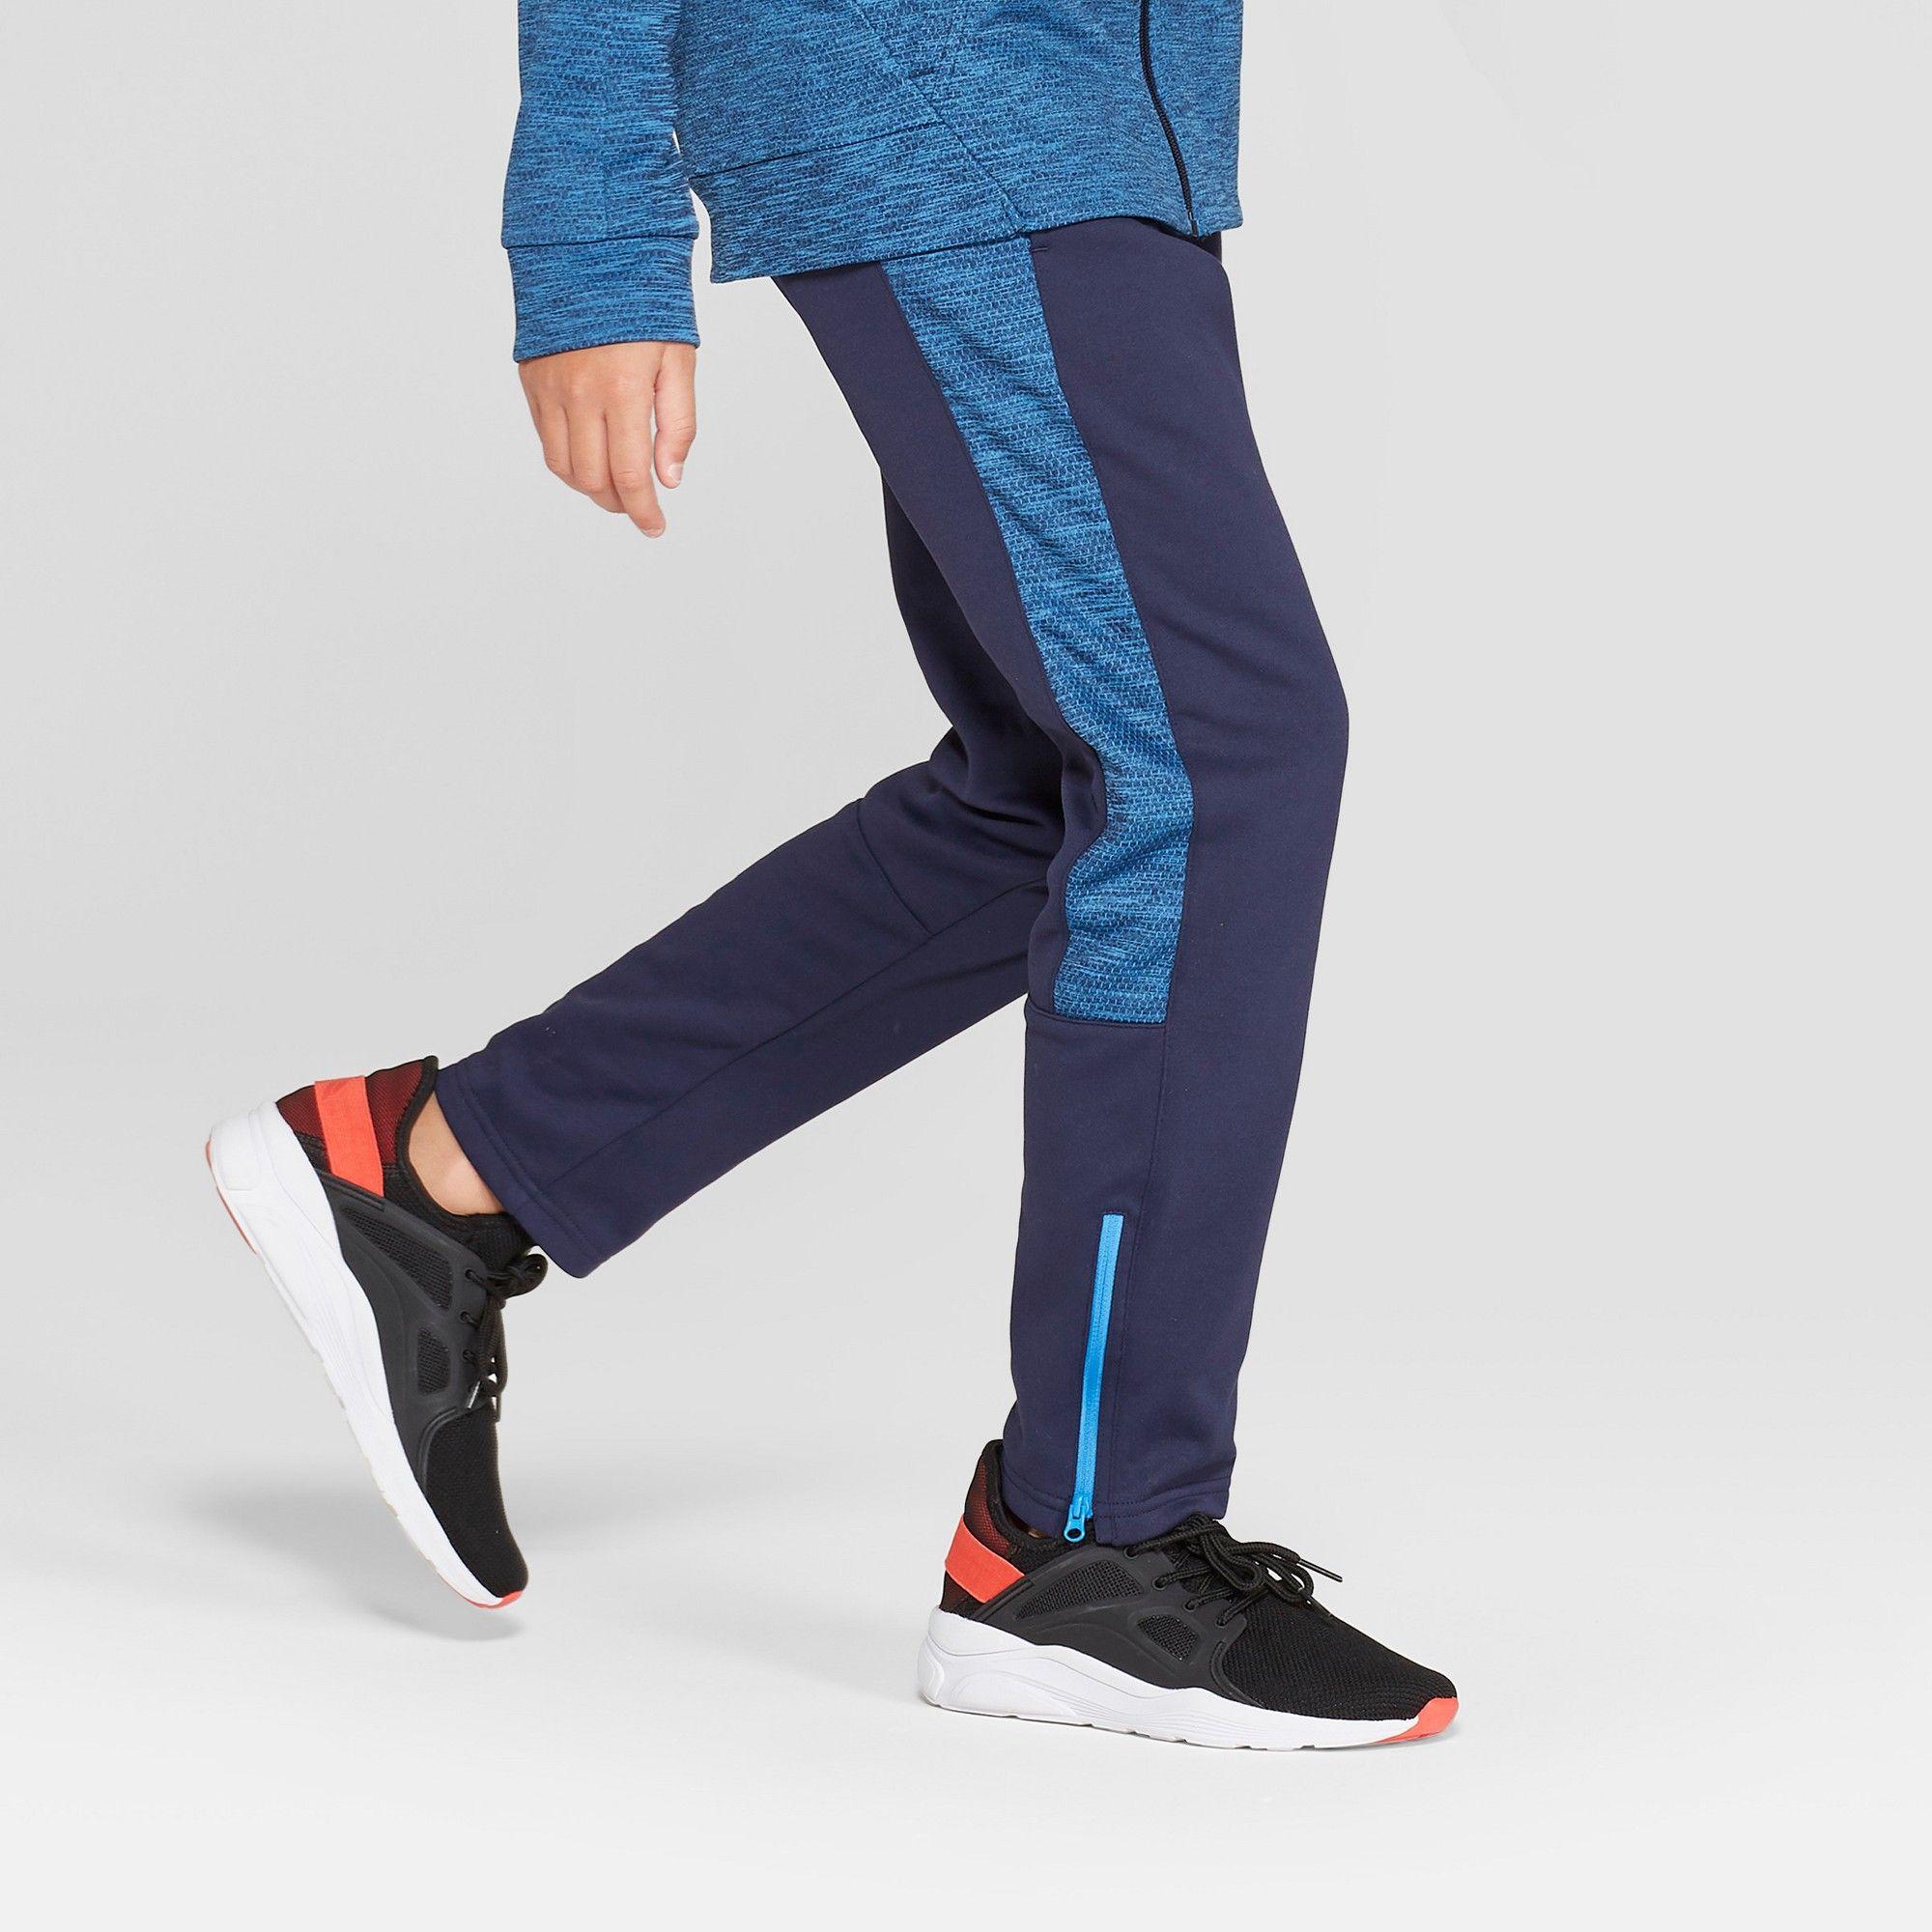 36b33e326062 Boys  Textured Tech Fleece Slim Fit Pants - C9 Champion Navy (Blue ...